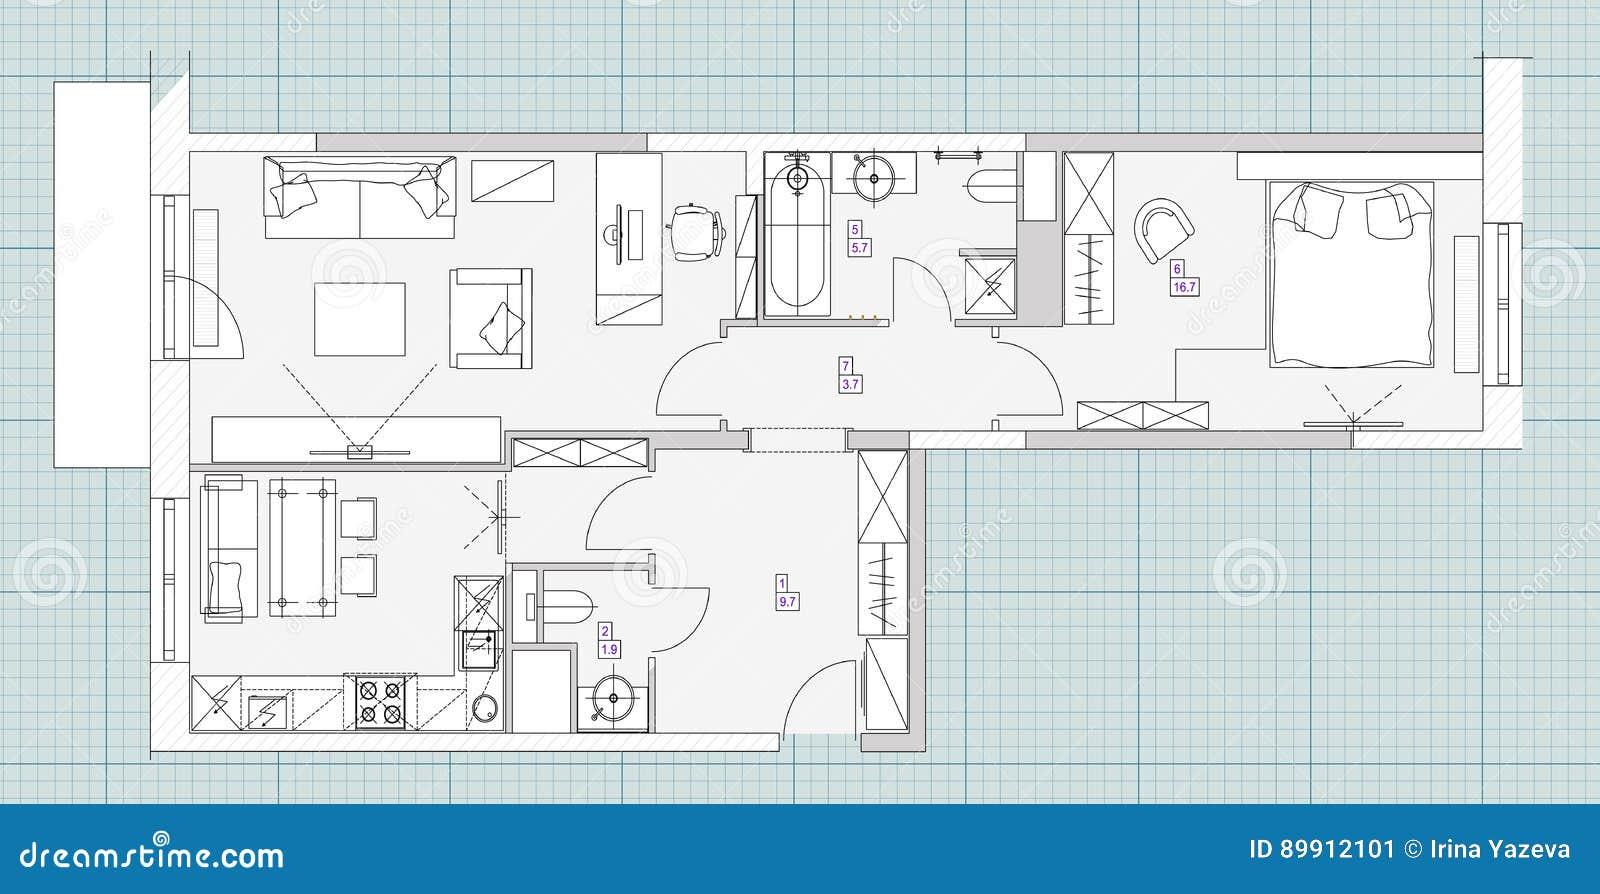 Standard Living Room Furniture Symbols Set Stock Vector